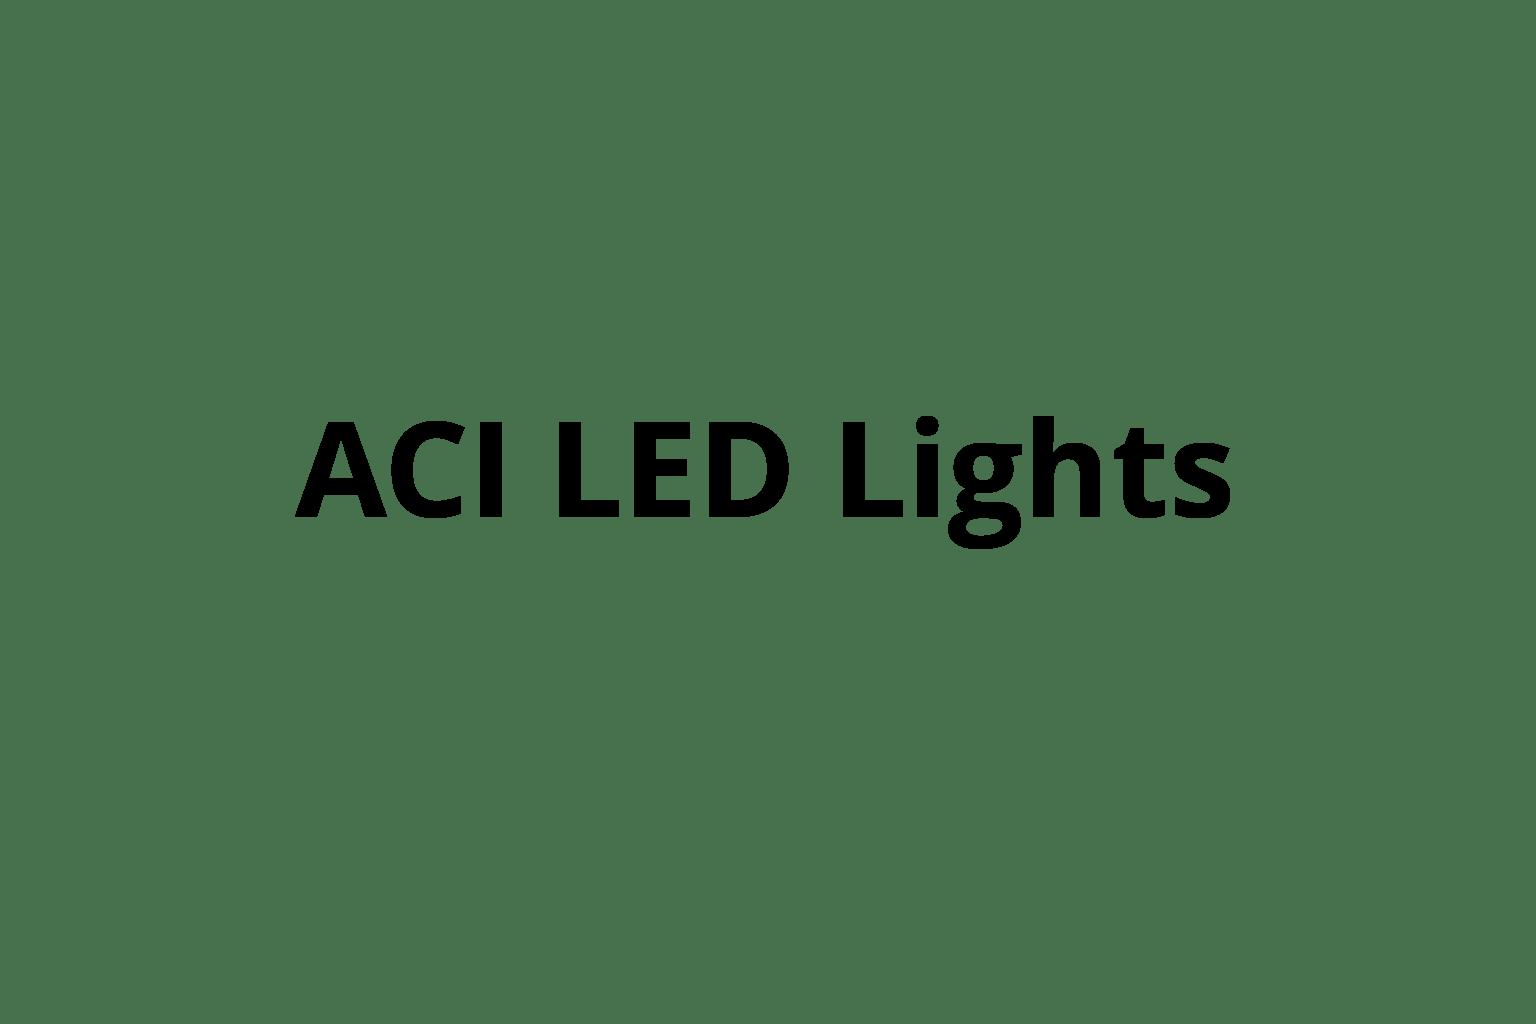 ACI LED LIghts